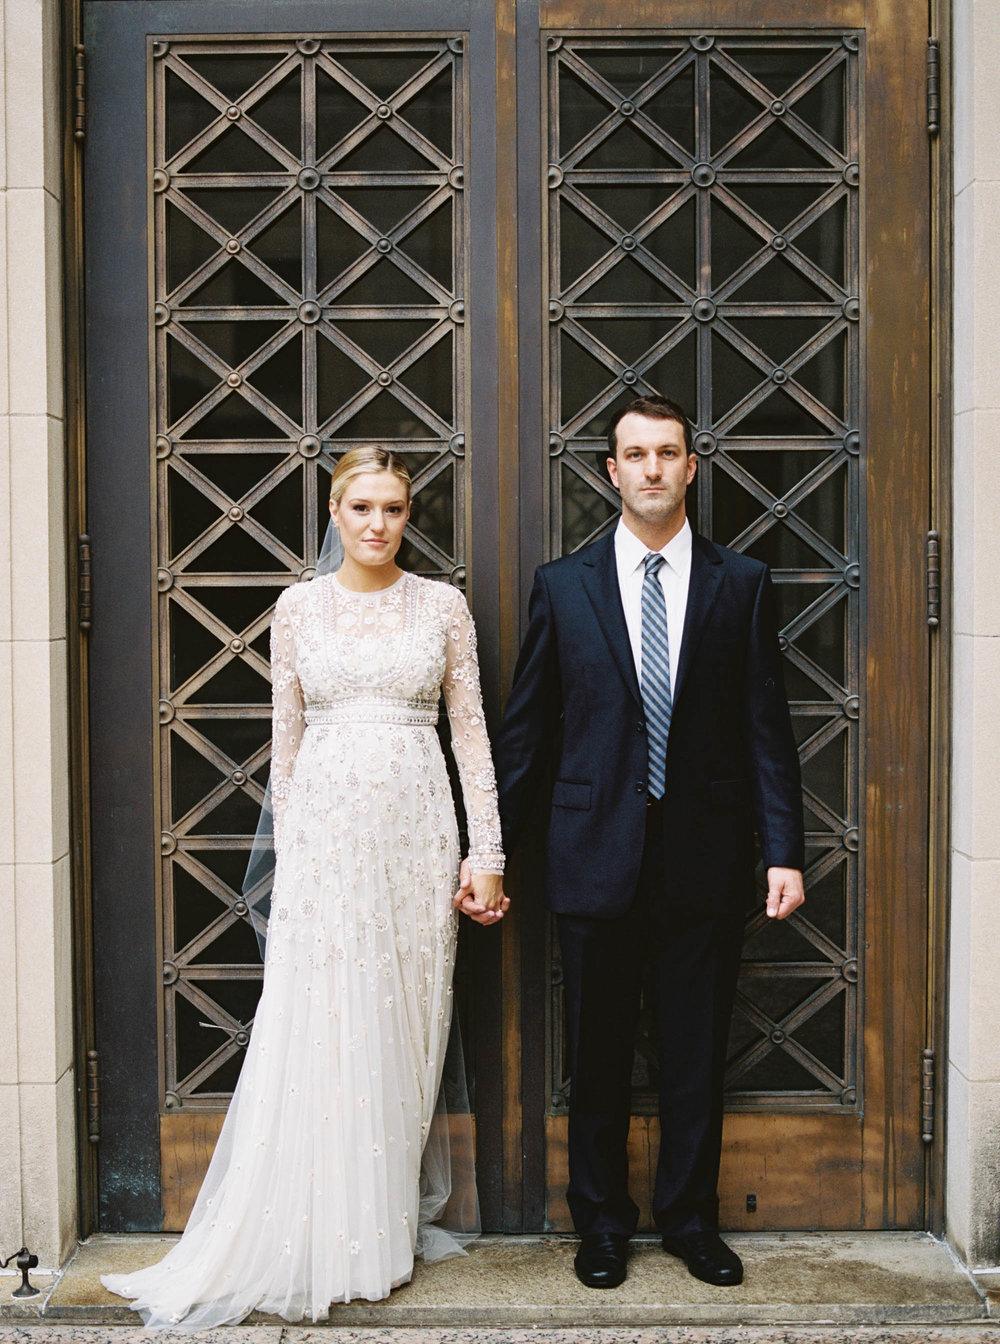 chris + jessica hermitage hotel wedding photographers nashville ©2017abigailbobophotography-10.jpg